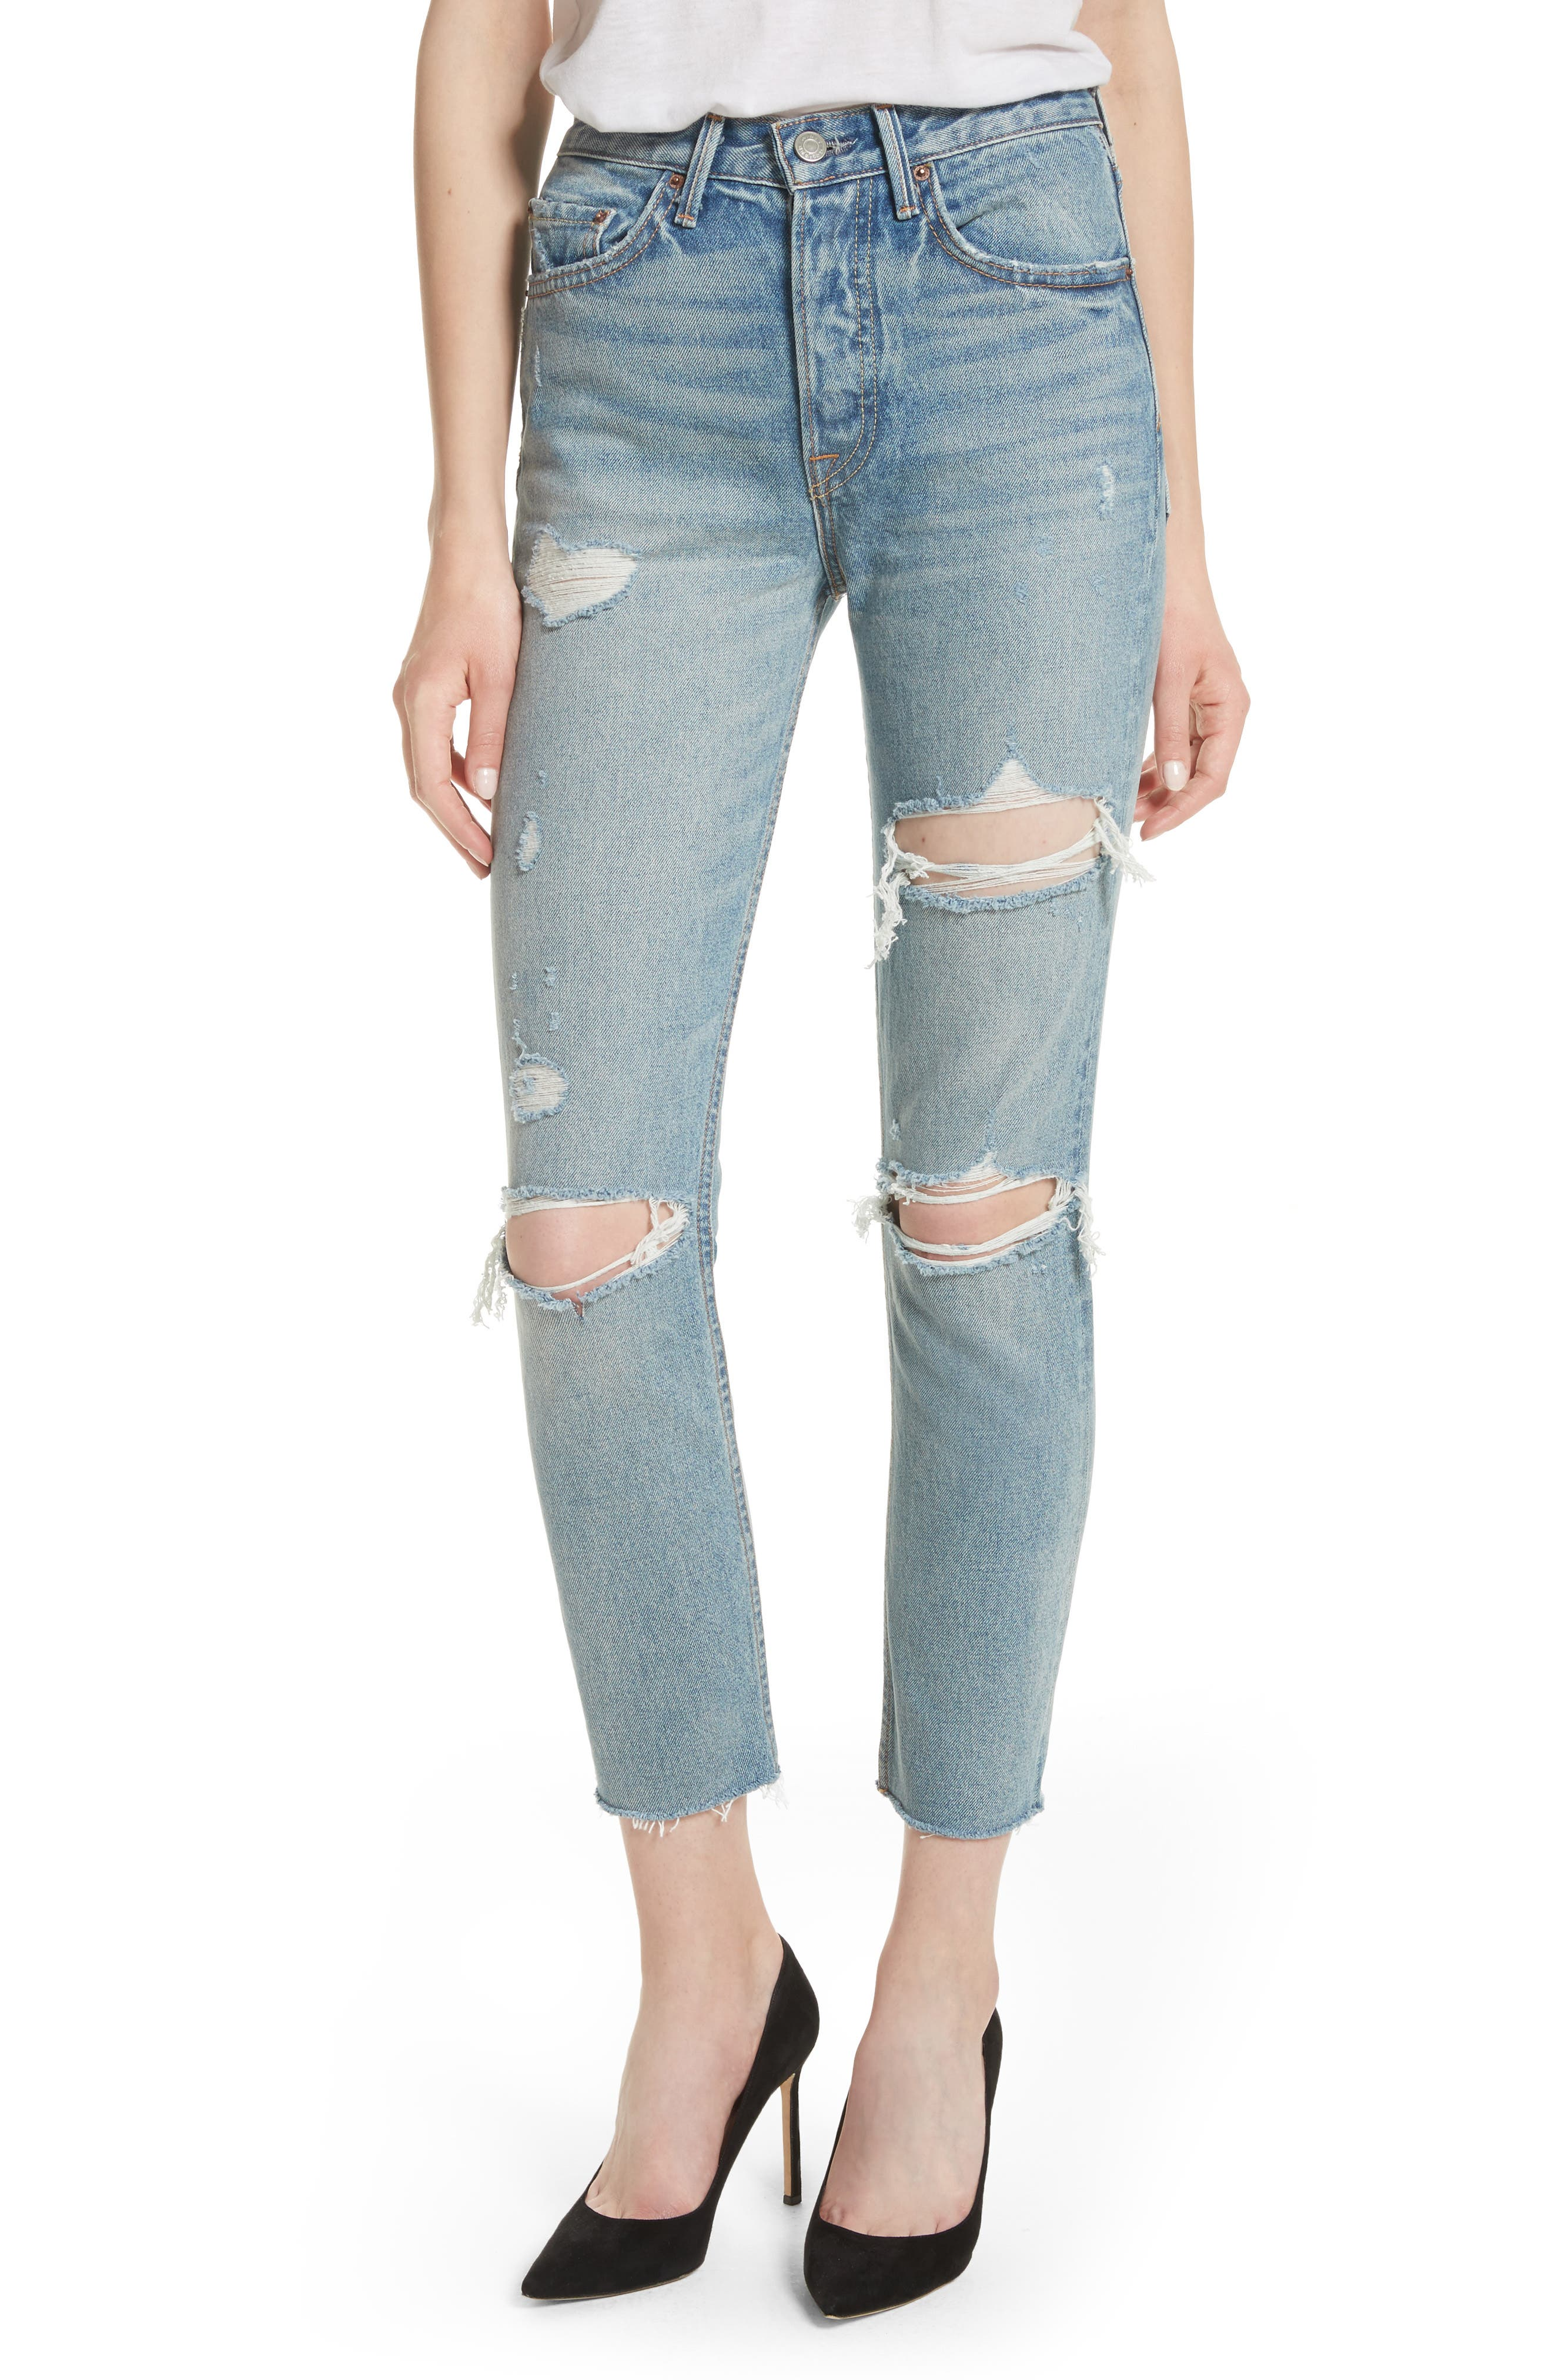 GRLFRND, Karolina Rigid High Waist Skinny Jeans, Main thumbnail 1, color, A LITTLE MORE LOVE